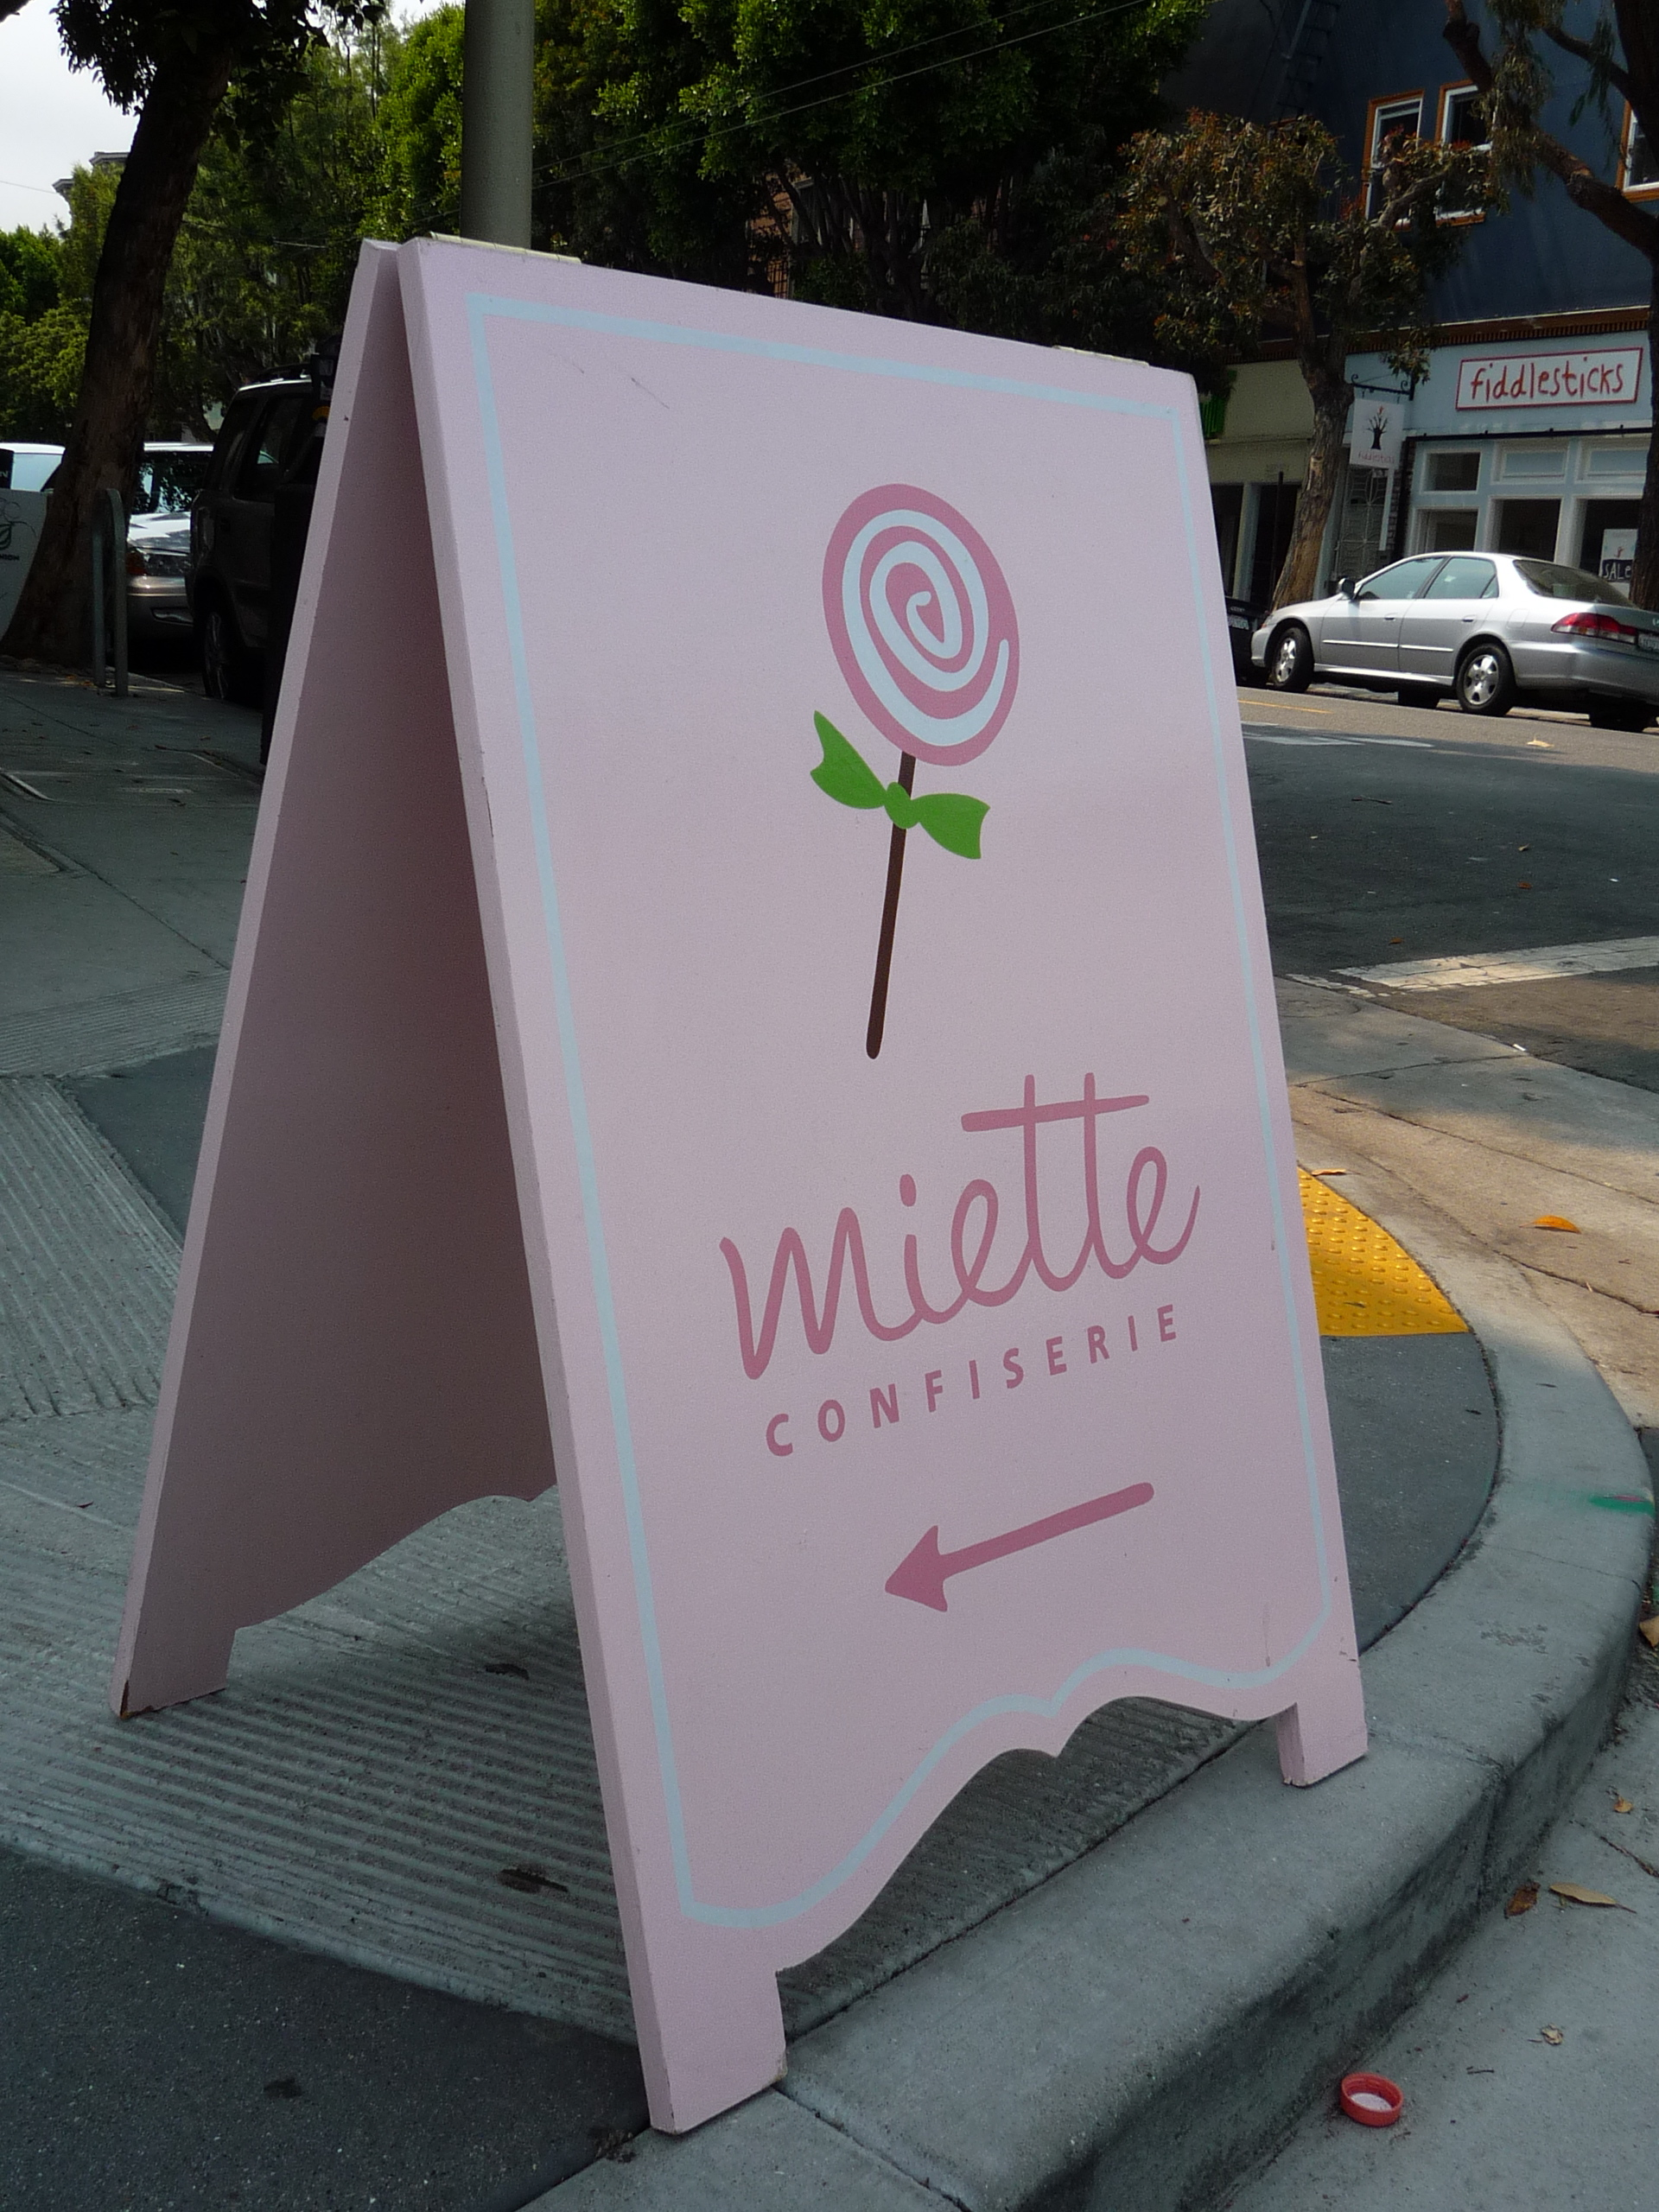 A-FRAME-miette-confiserie-sandwich-board_3059512399_o.jpg